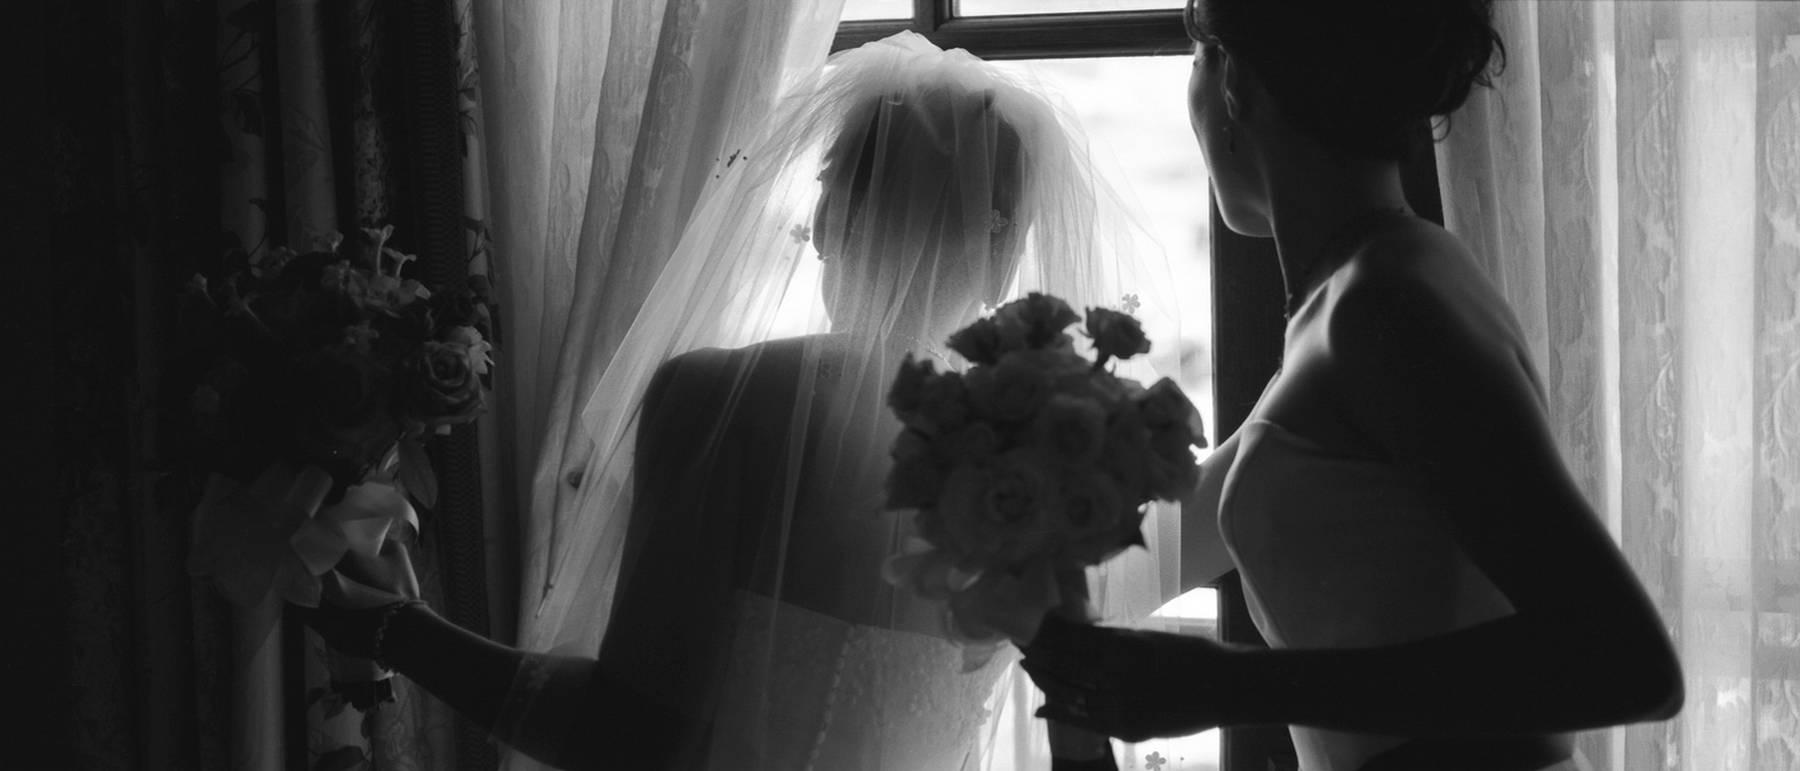 johnandjoseph-wedding-photographer-hz-slider-339